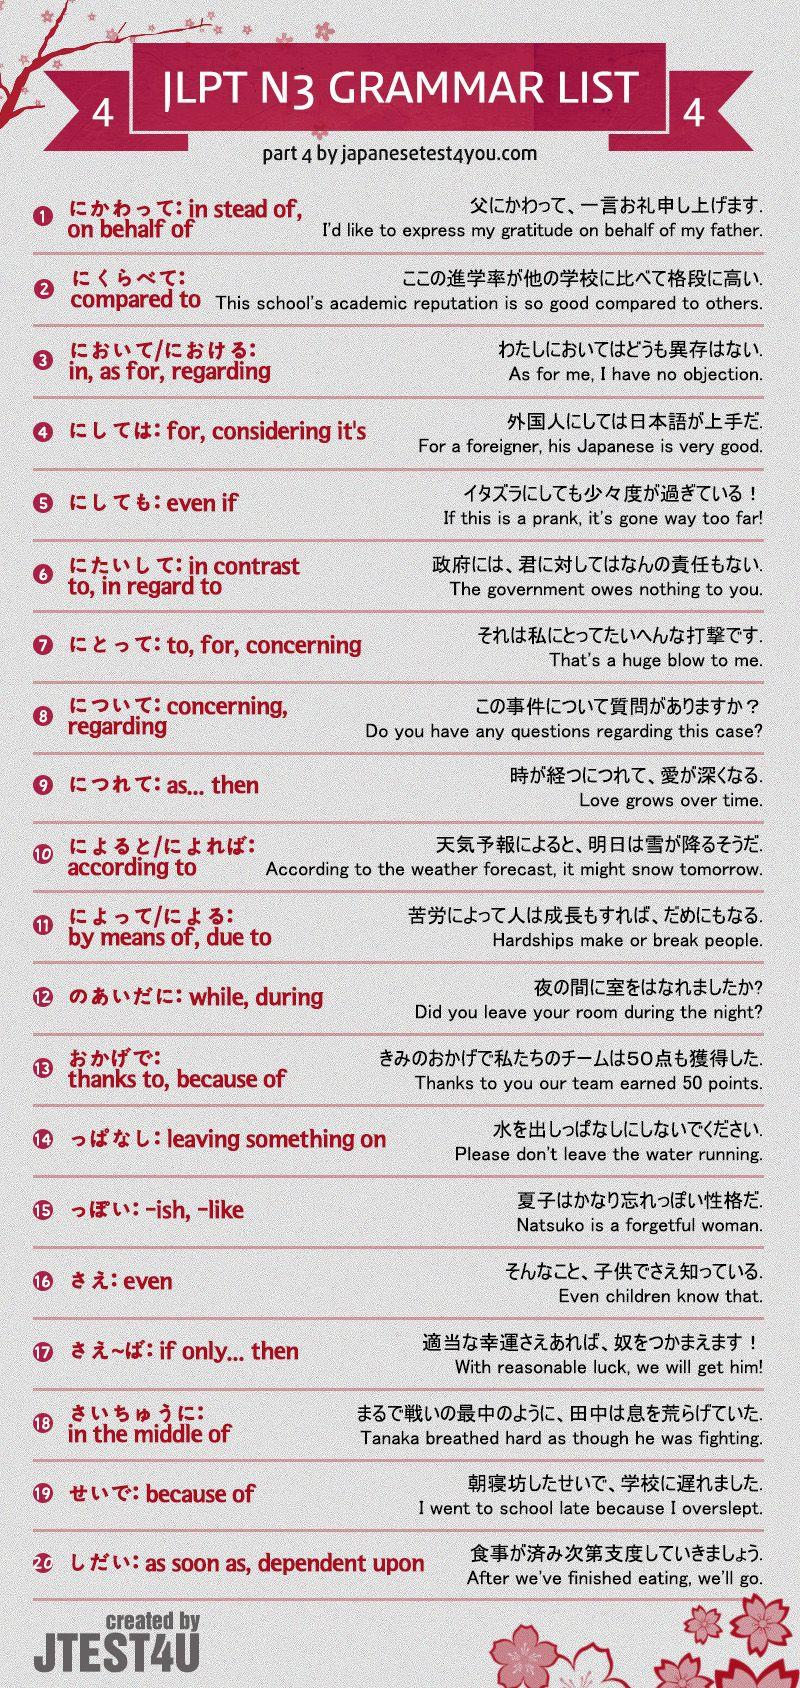 Japanese tests for you, JLPT N3 grammar list part 4 Source